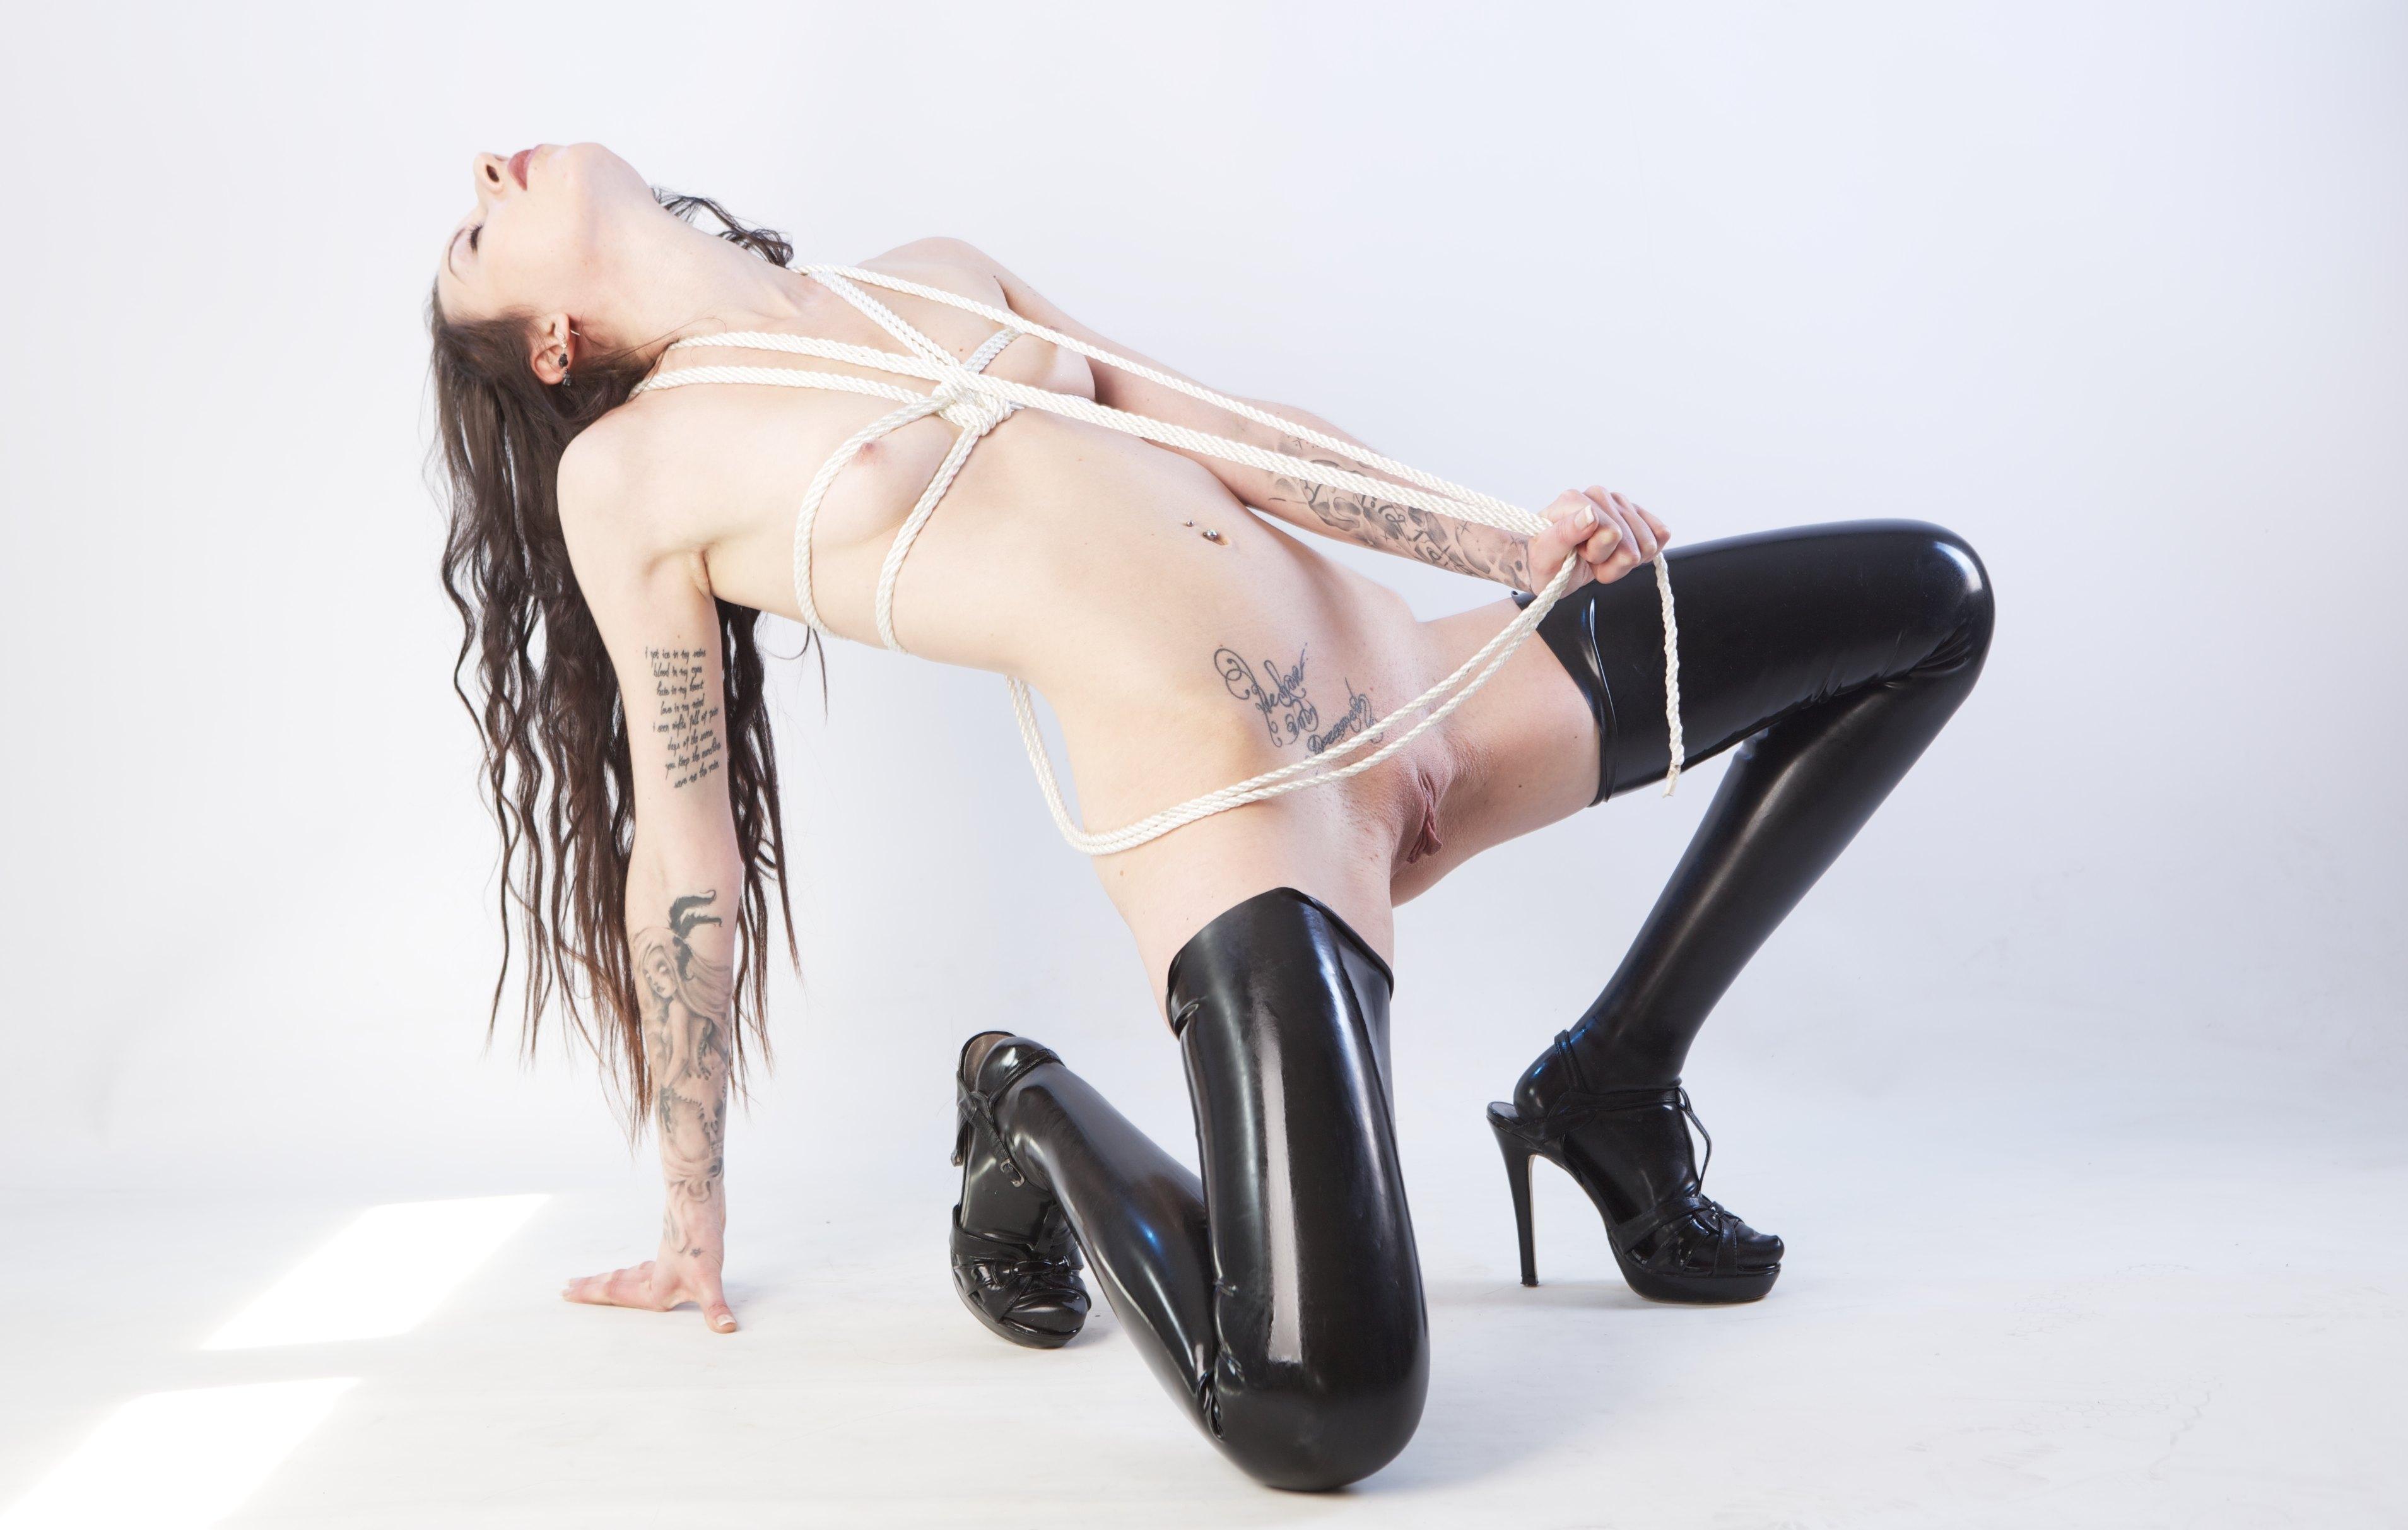 in babe tara stockings hot